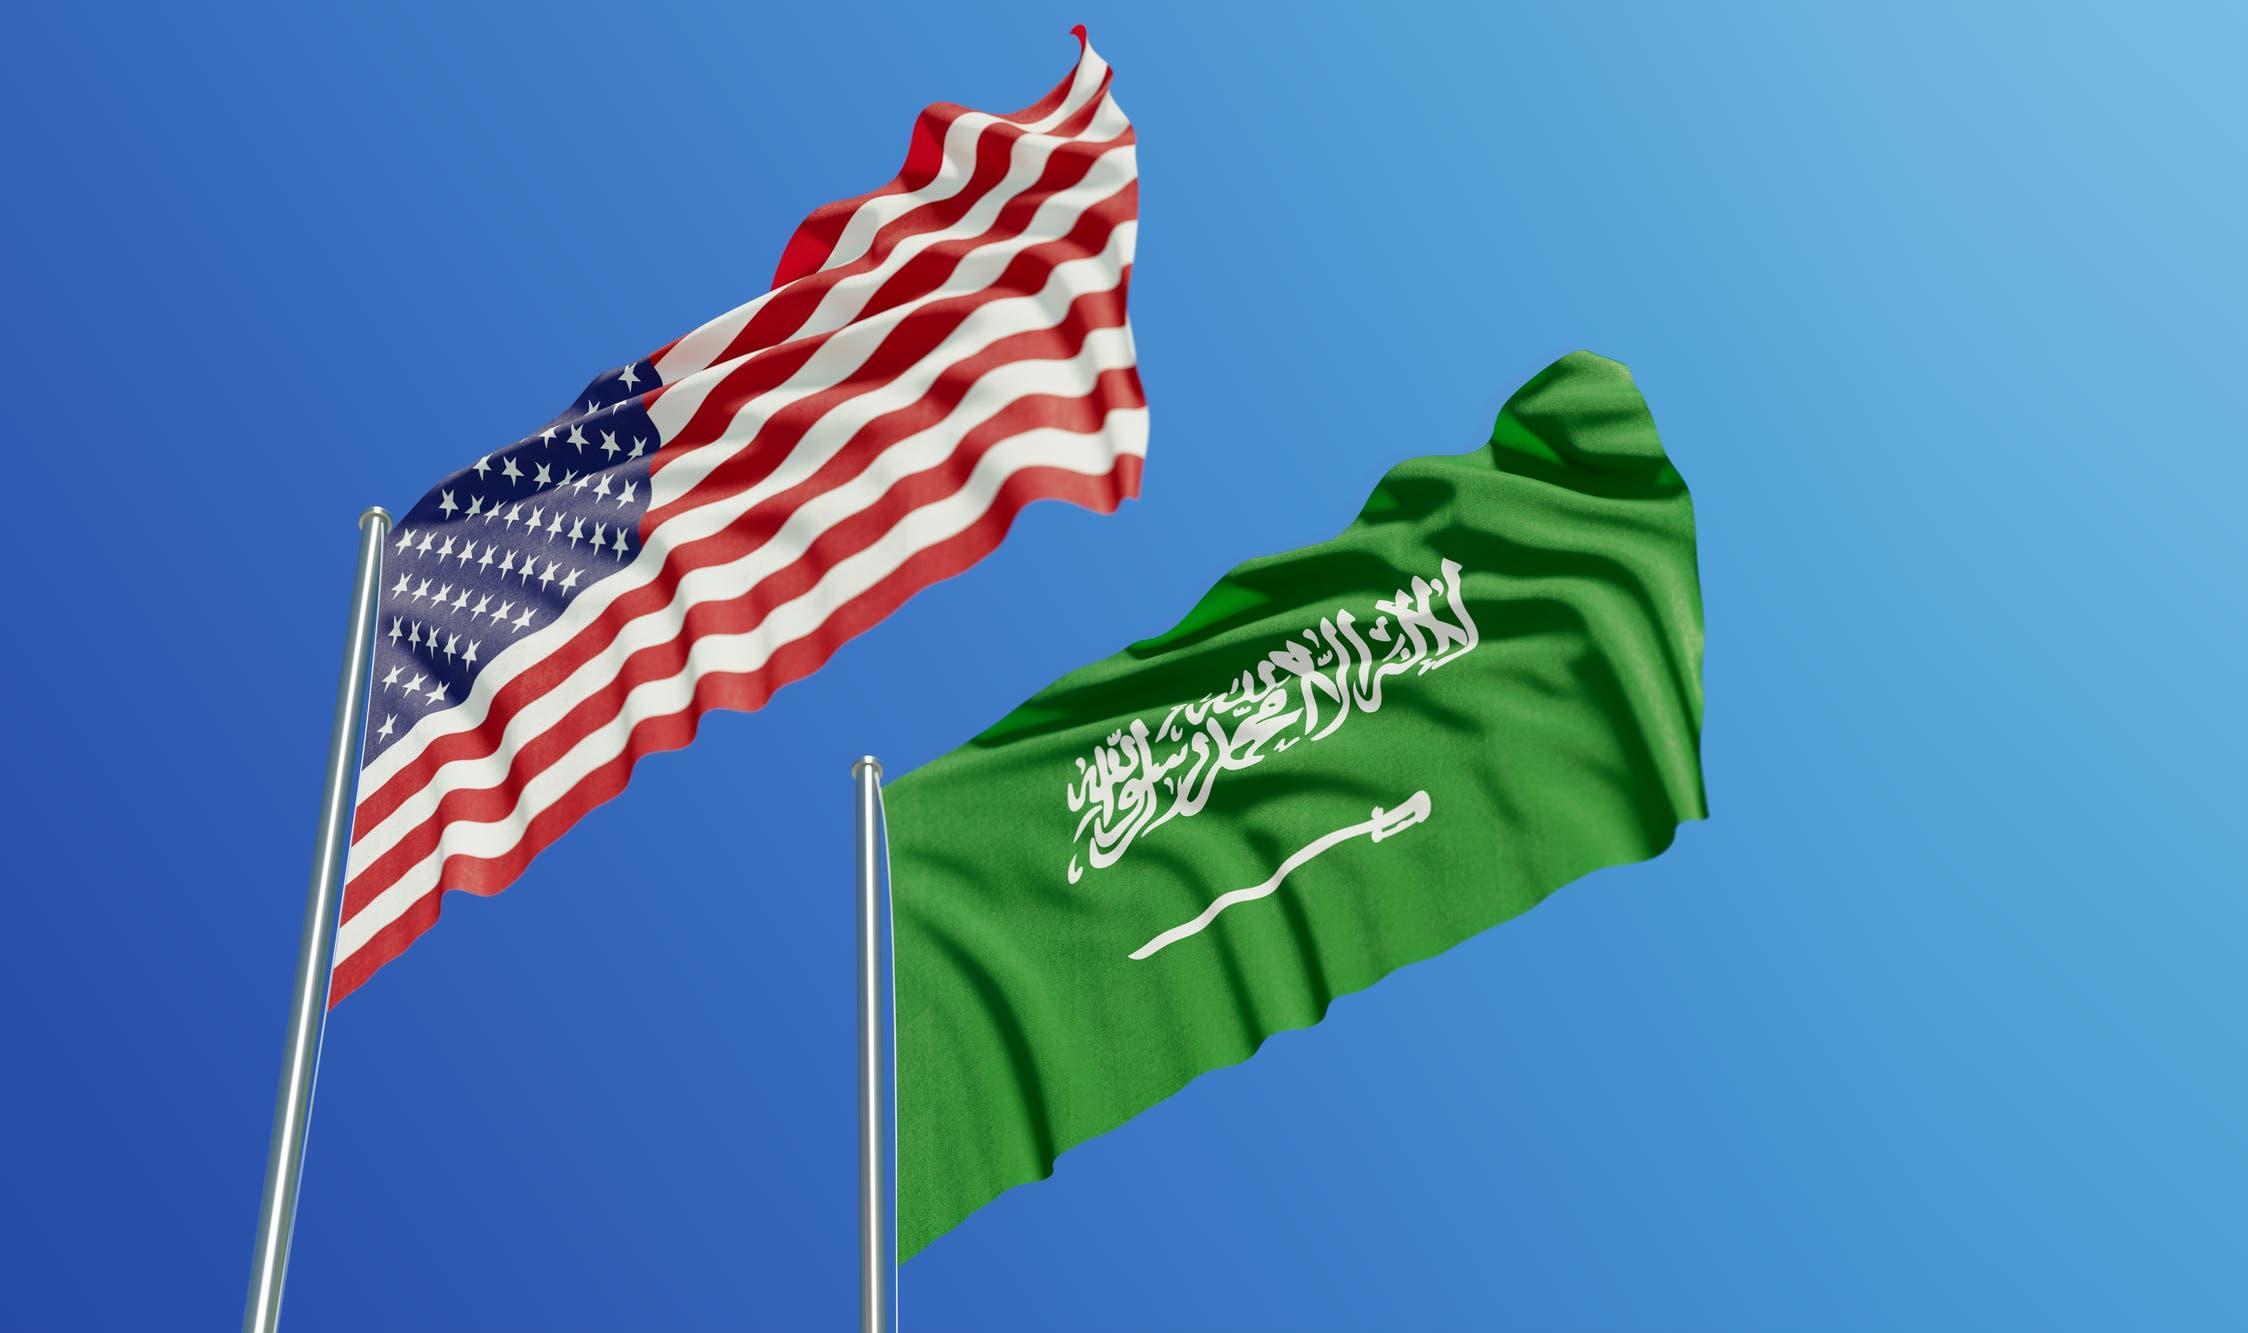 Flags of the USA and Saudi Arabia. (File photo)